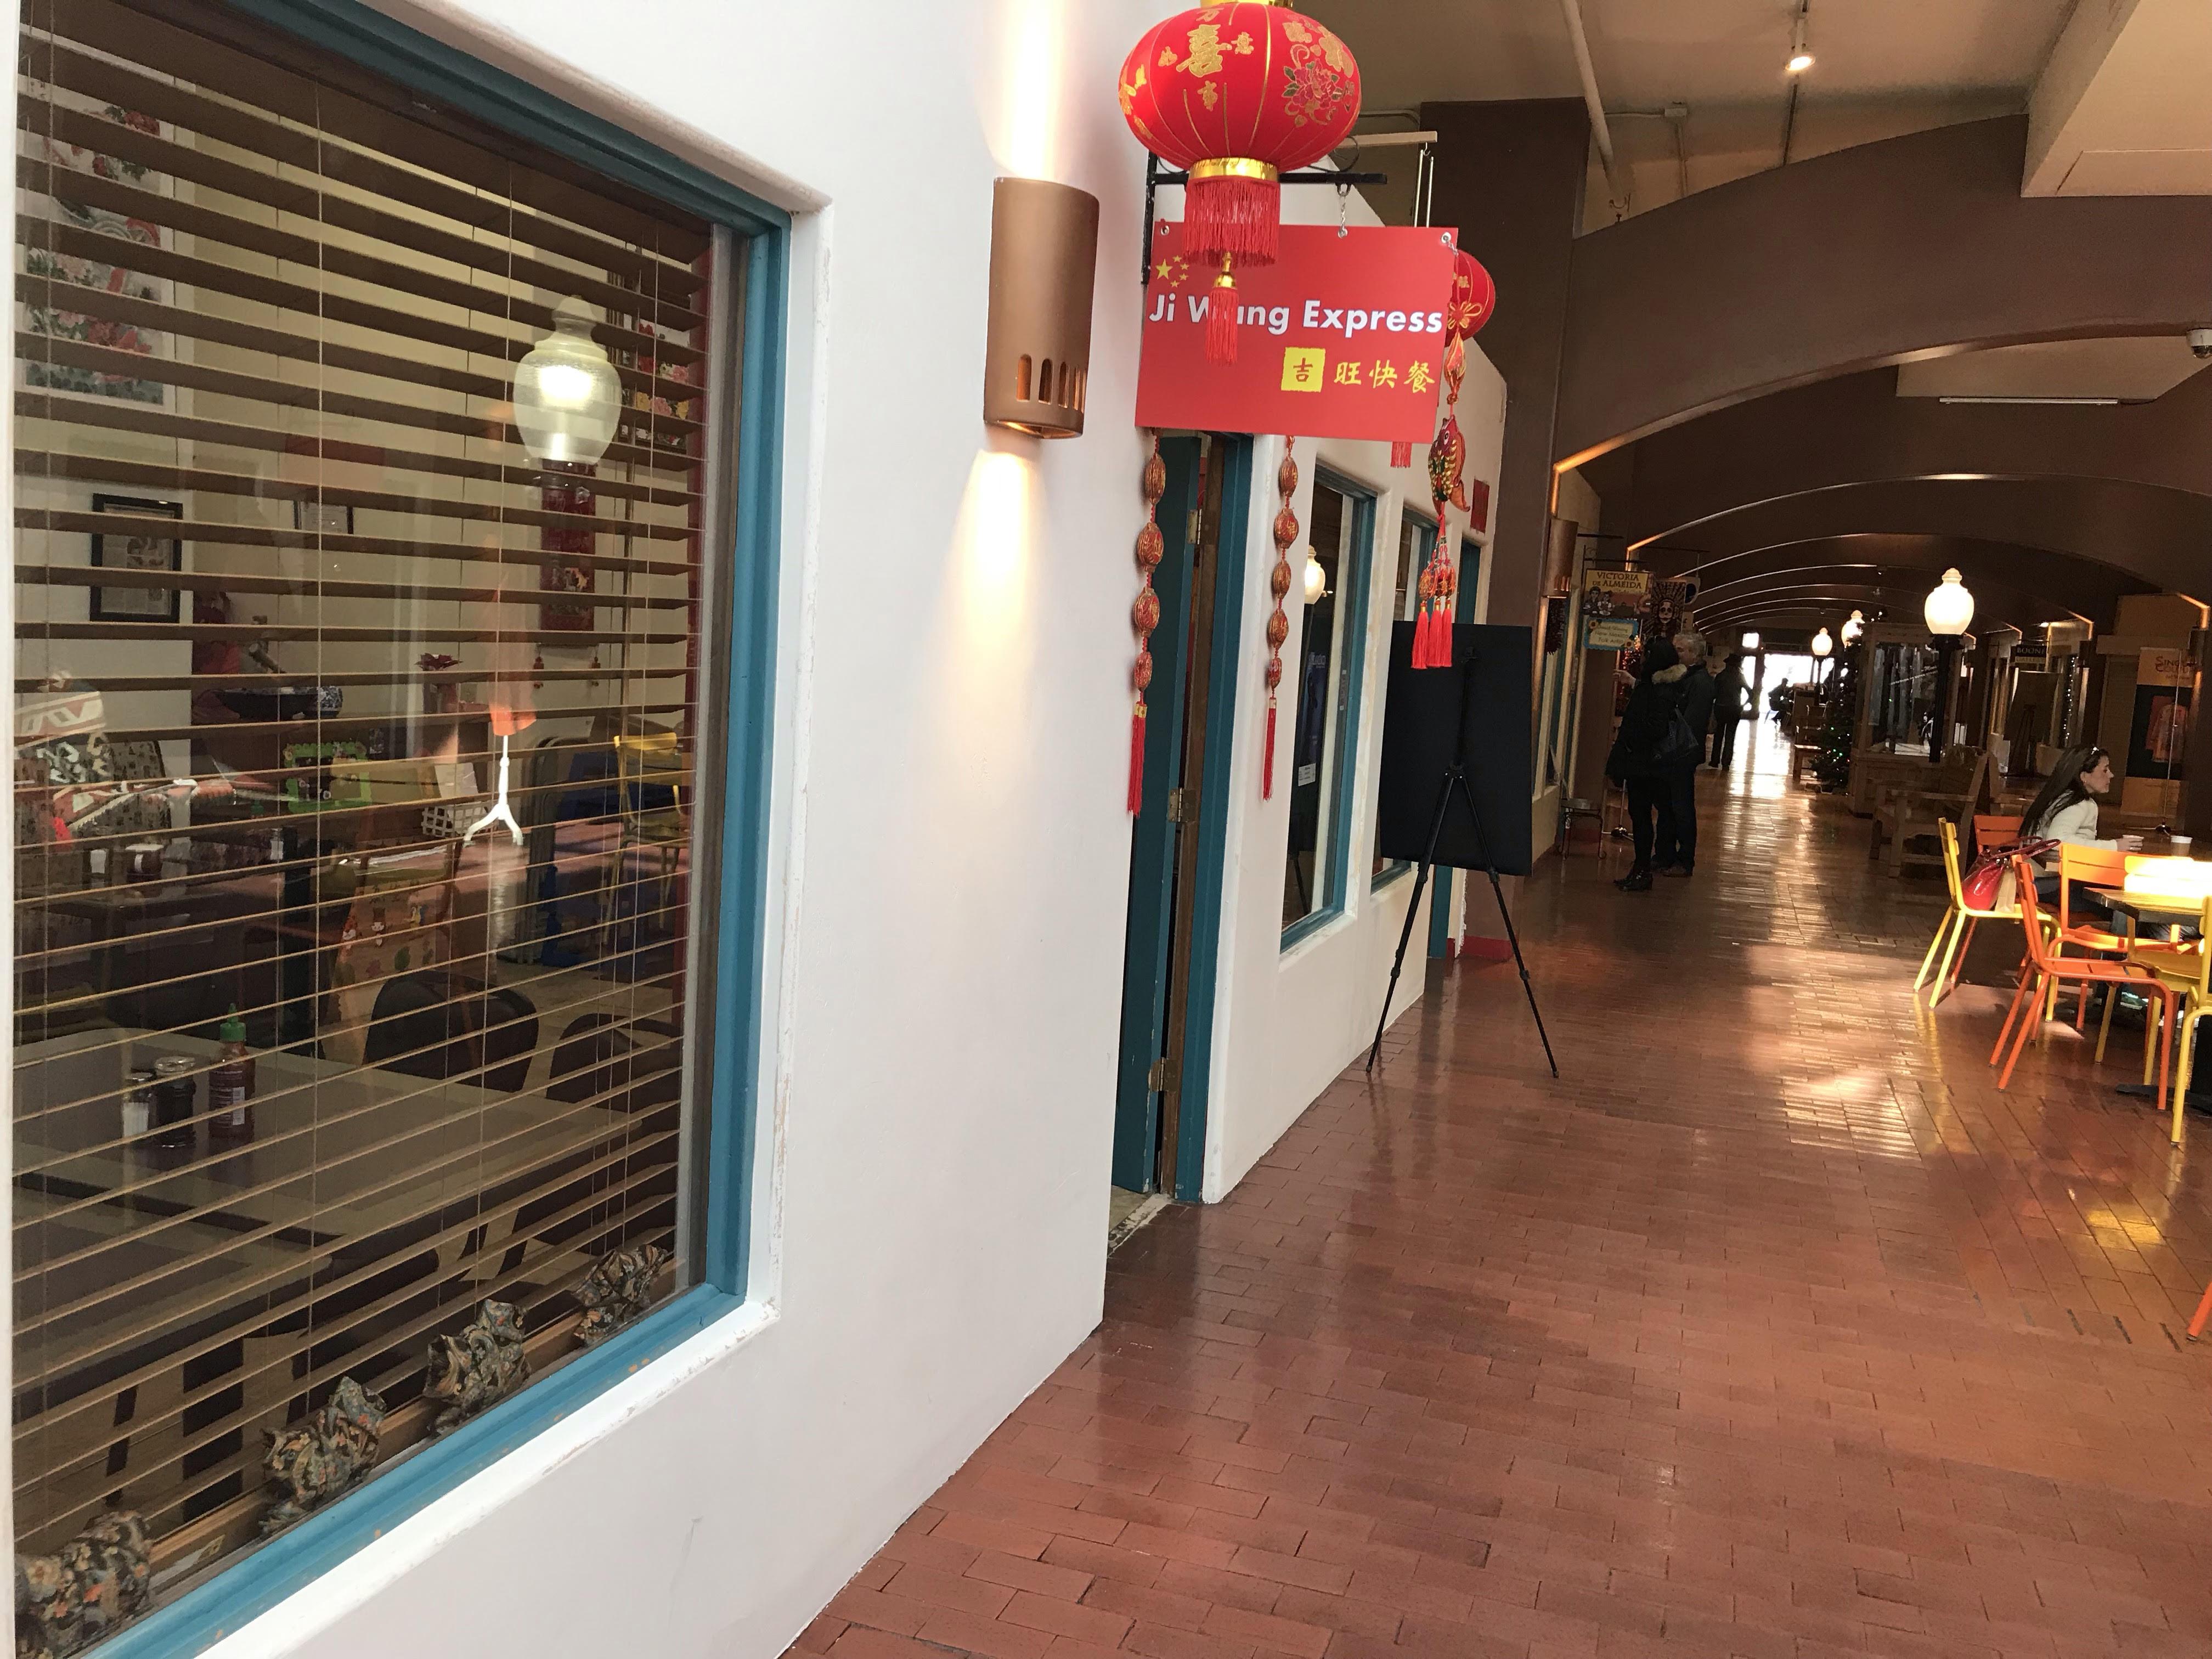 NM中餐馆转让, Restaurant for sale